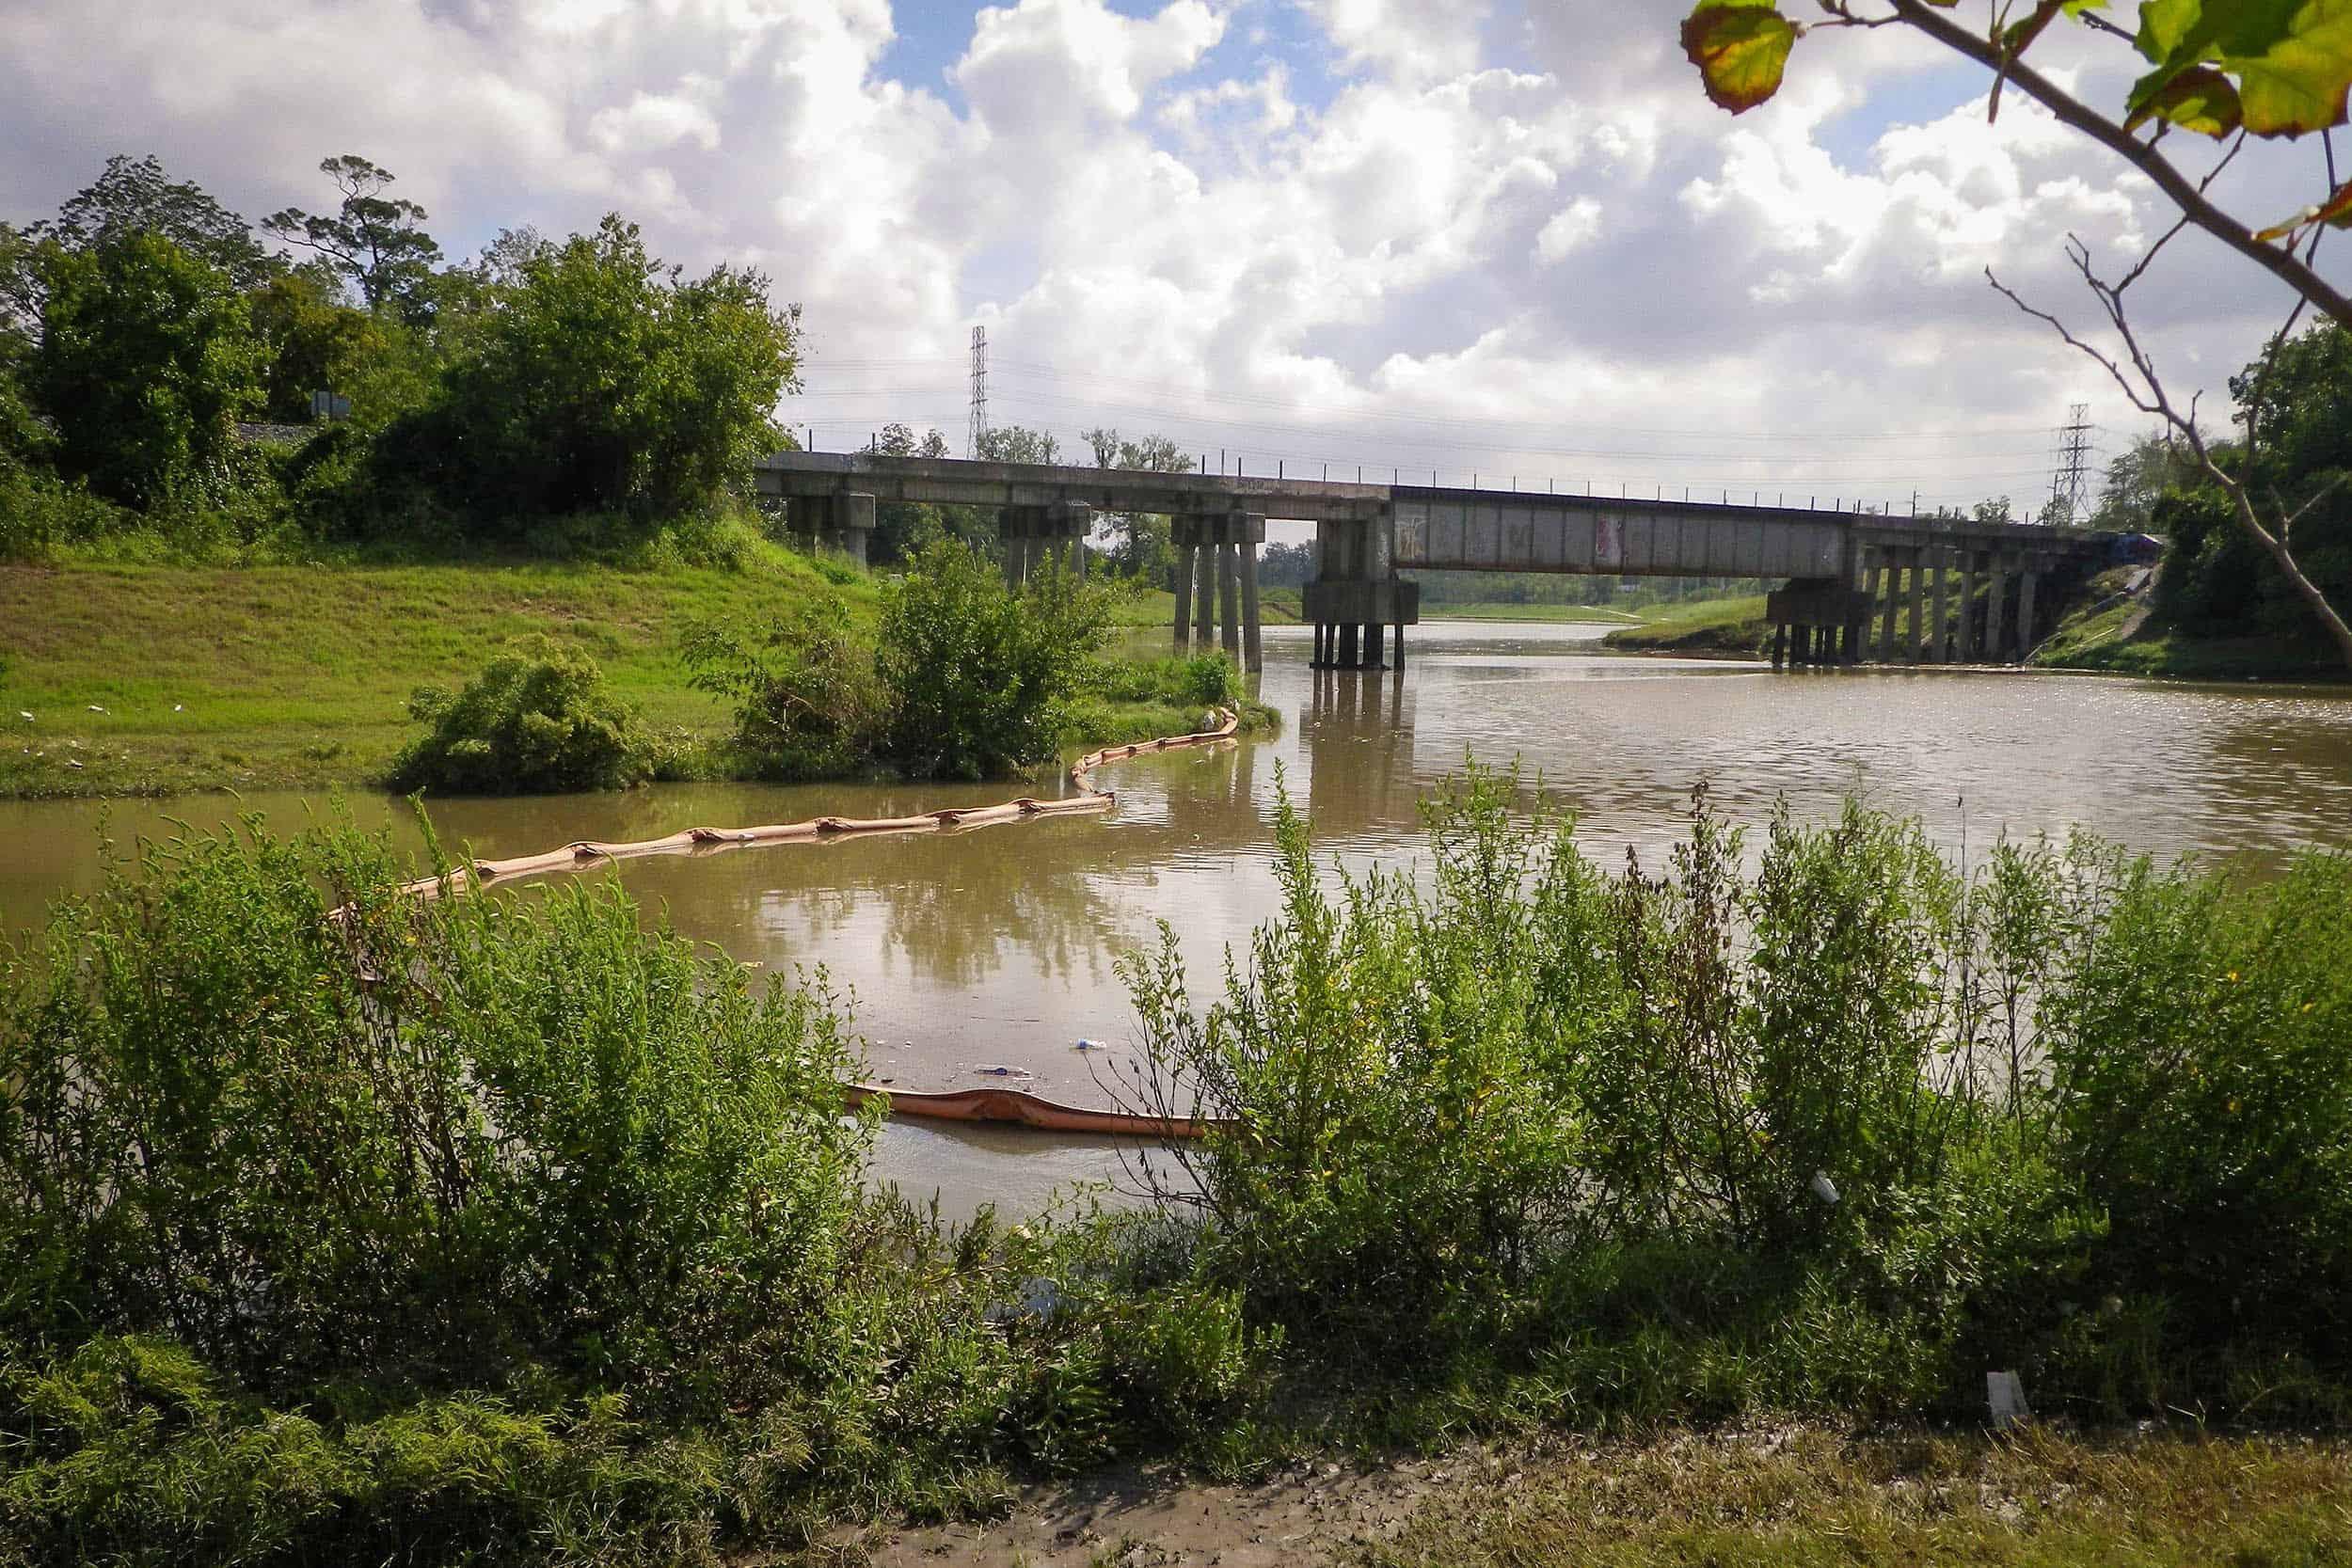 Trash boom/float at pond 3 outlet to Brays Bayou